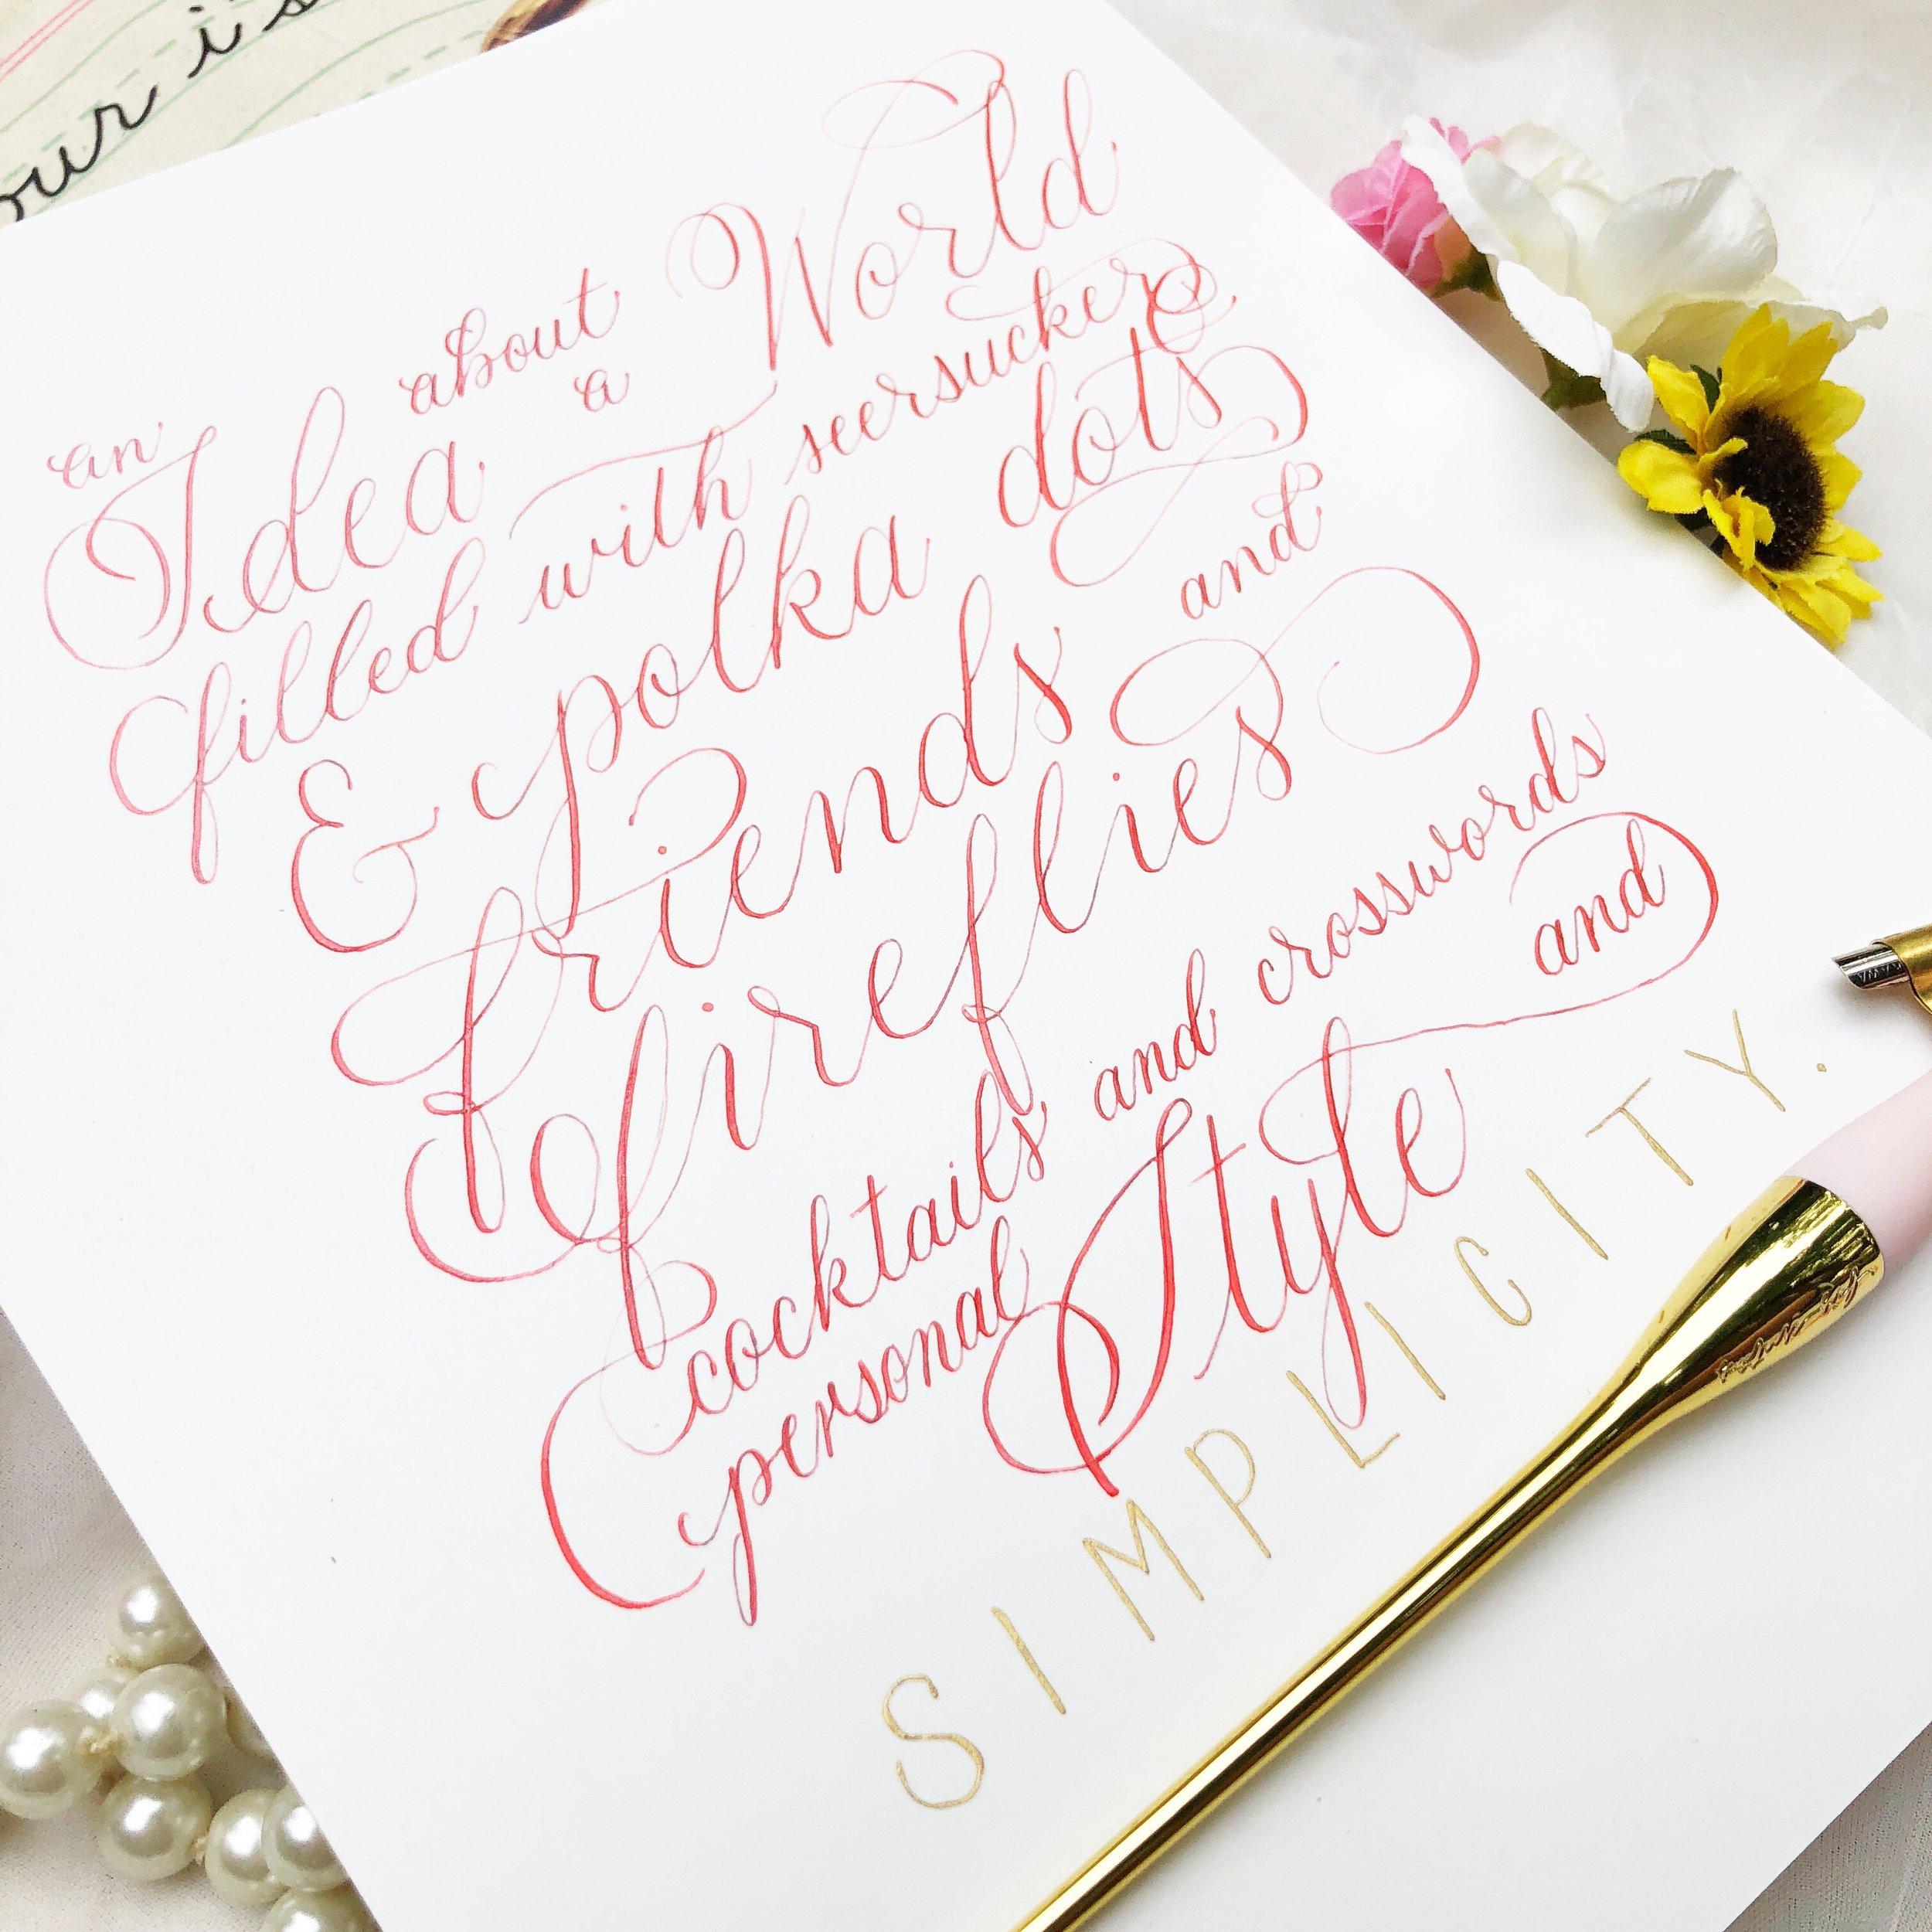 Central PA, York PA, JesSmith Designs, custom, wedding, invitations, bridal, Harrisburg, hanover, calligraphy, baltimore, wedding invitations, lancaster, gettysburg, 06-09 06.44.25.jpg